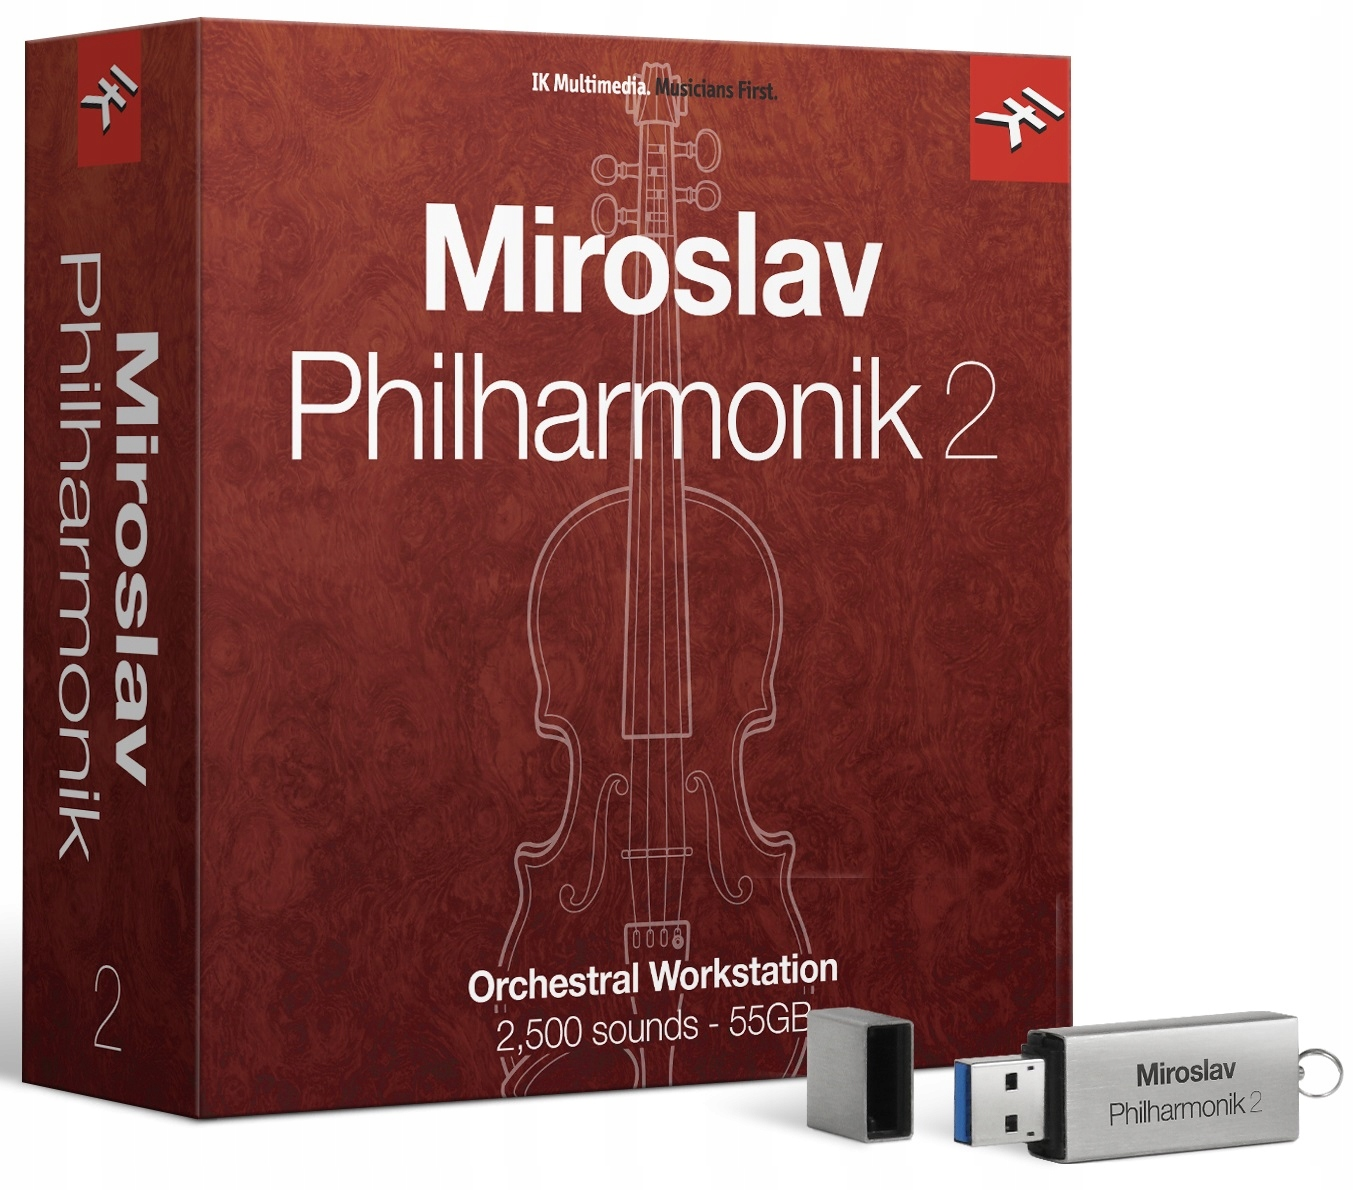 IK Multimédiá Miroslav Philharmonik 2 | Licencia